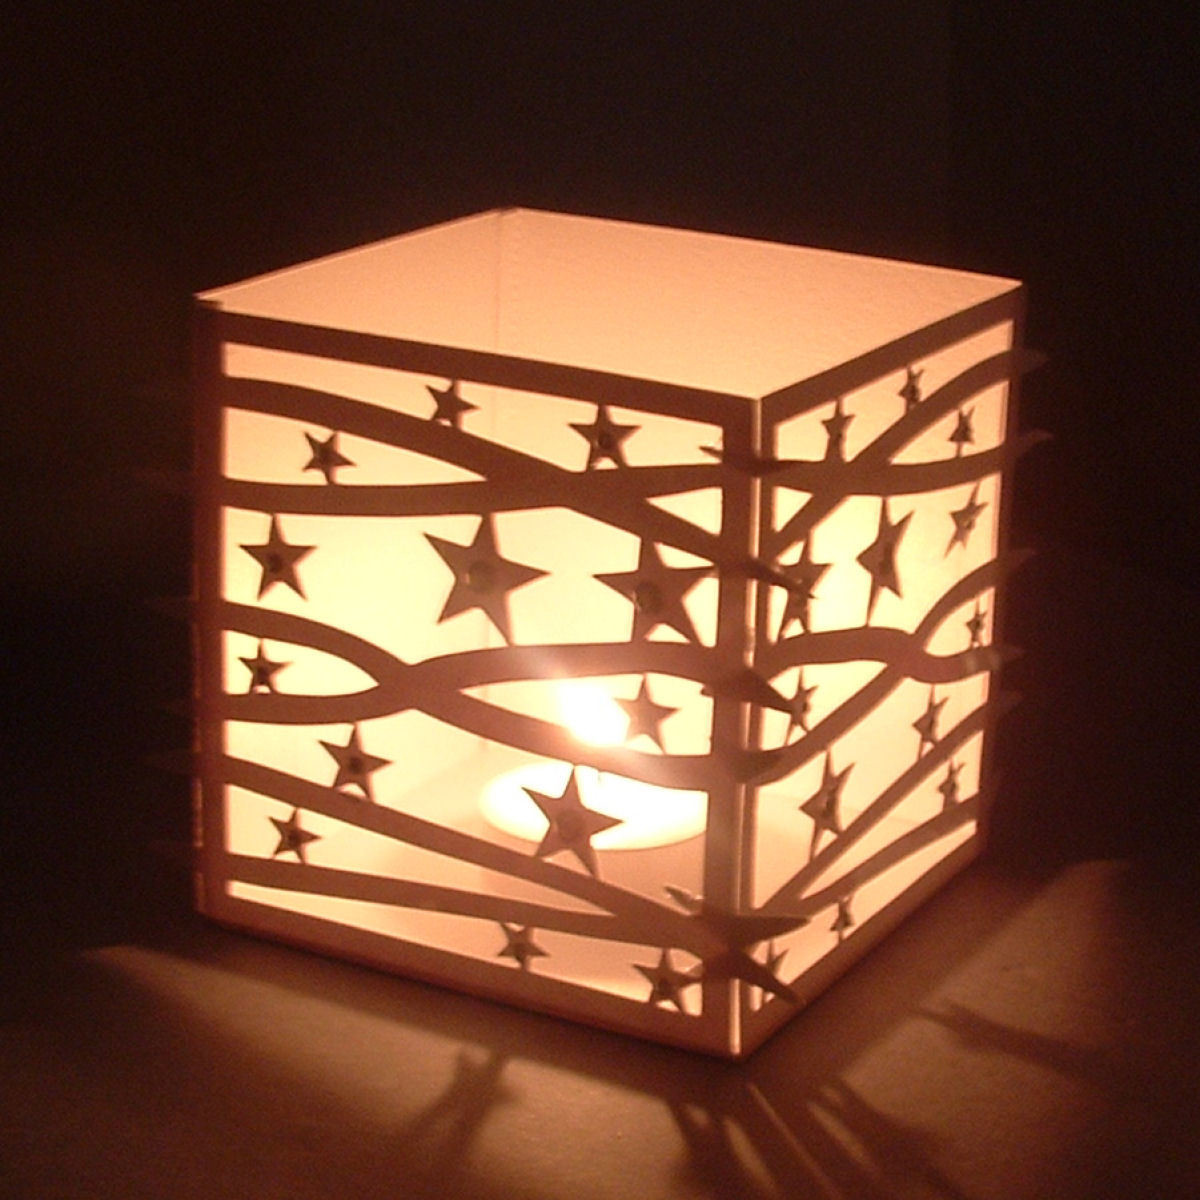 Cube - star pattern luminaire